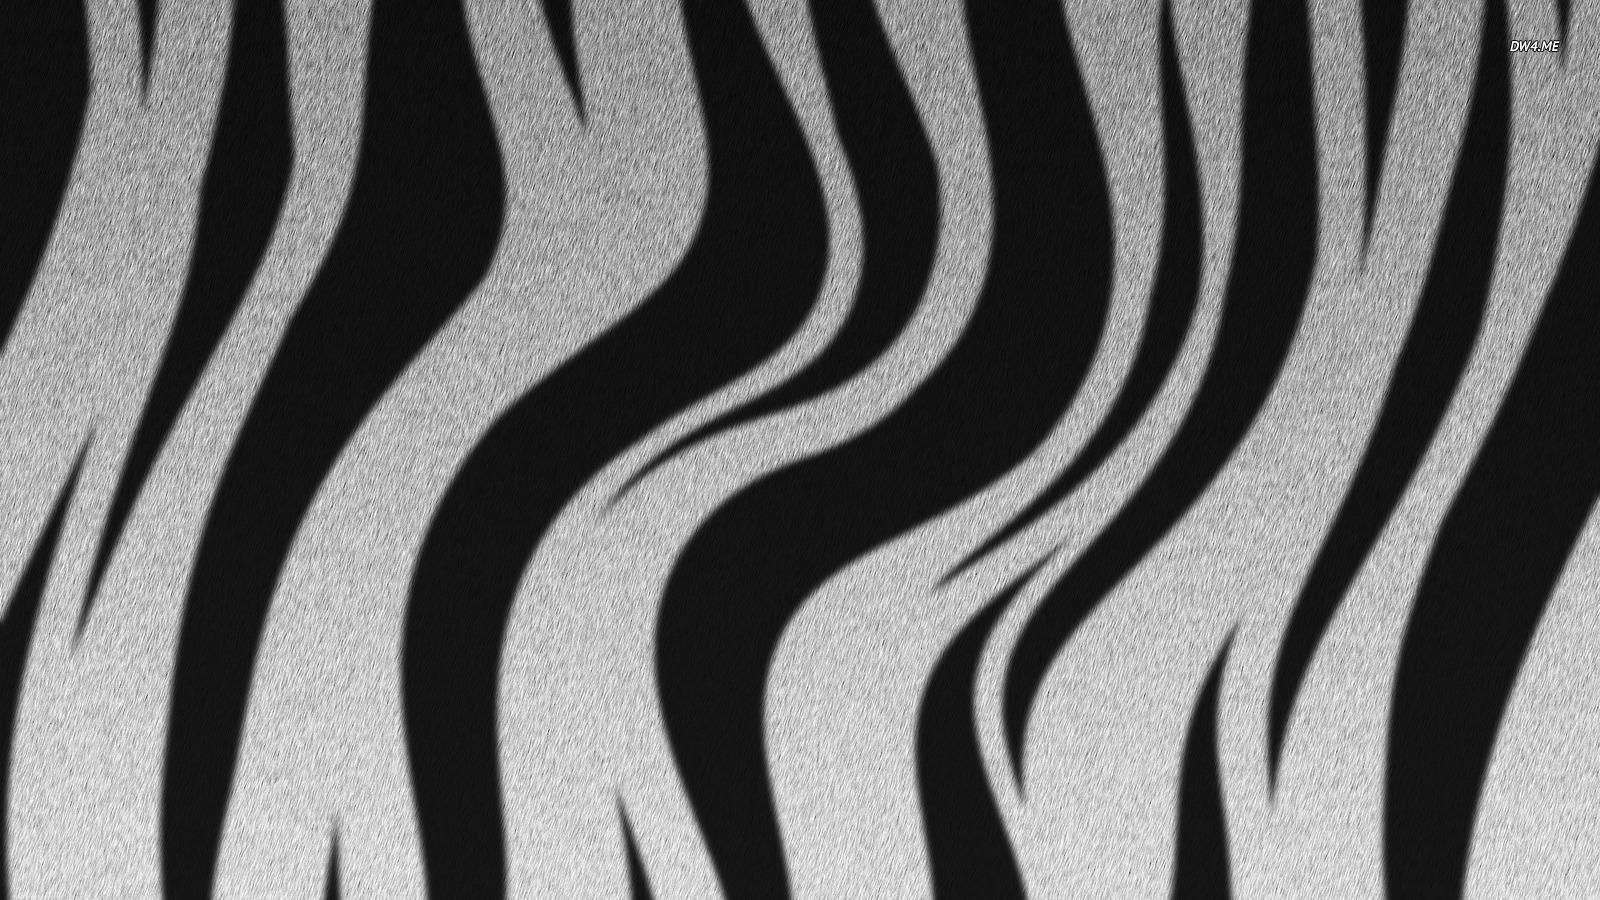 Zebra stripes wallpaper   Digital Art wallpapers   752 1600x900